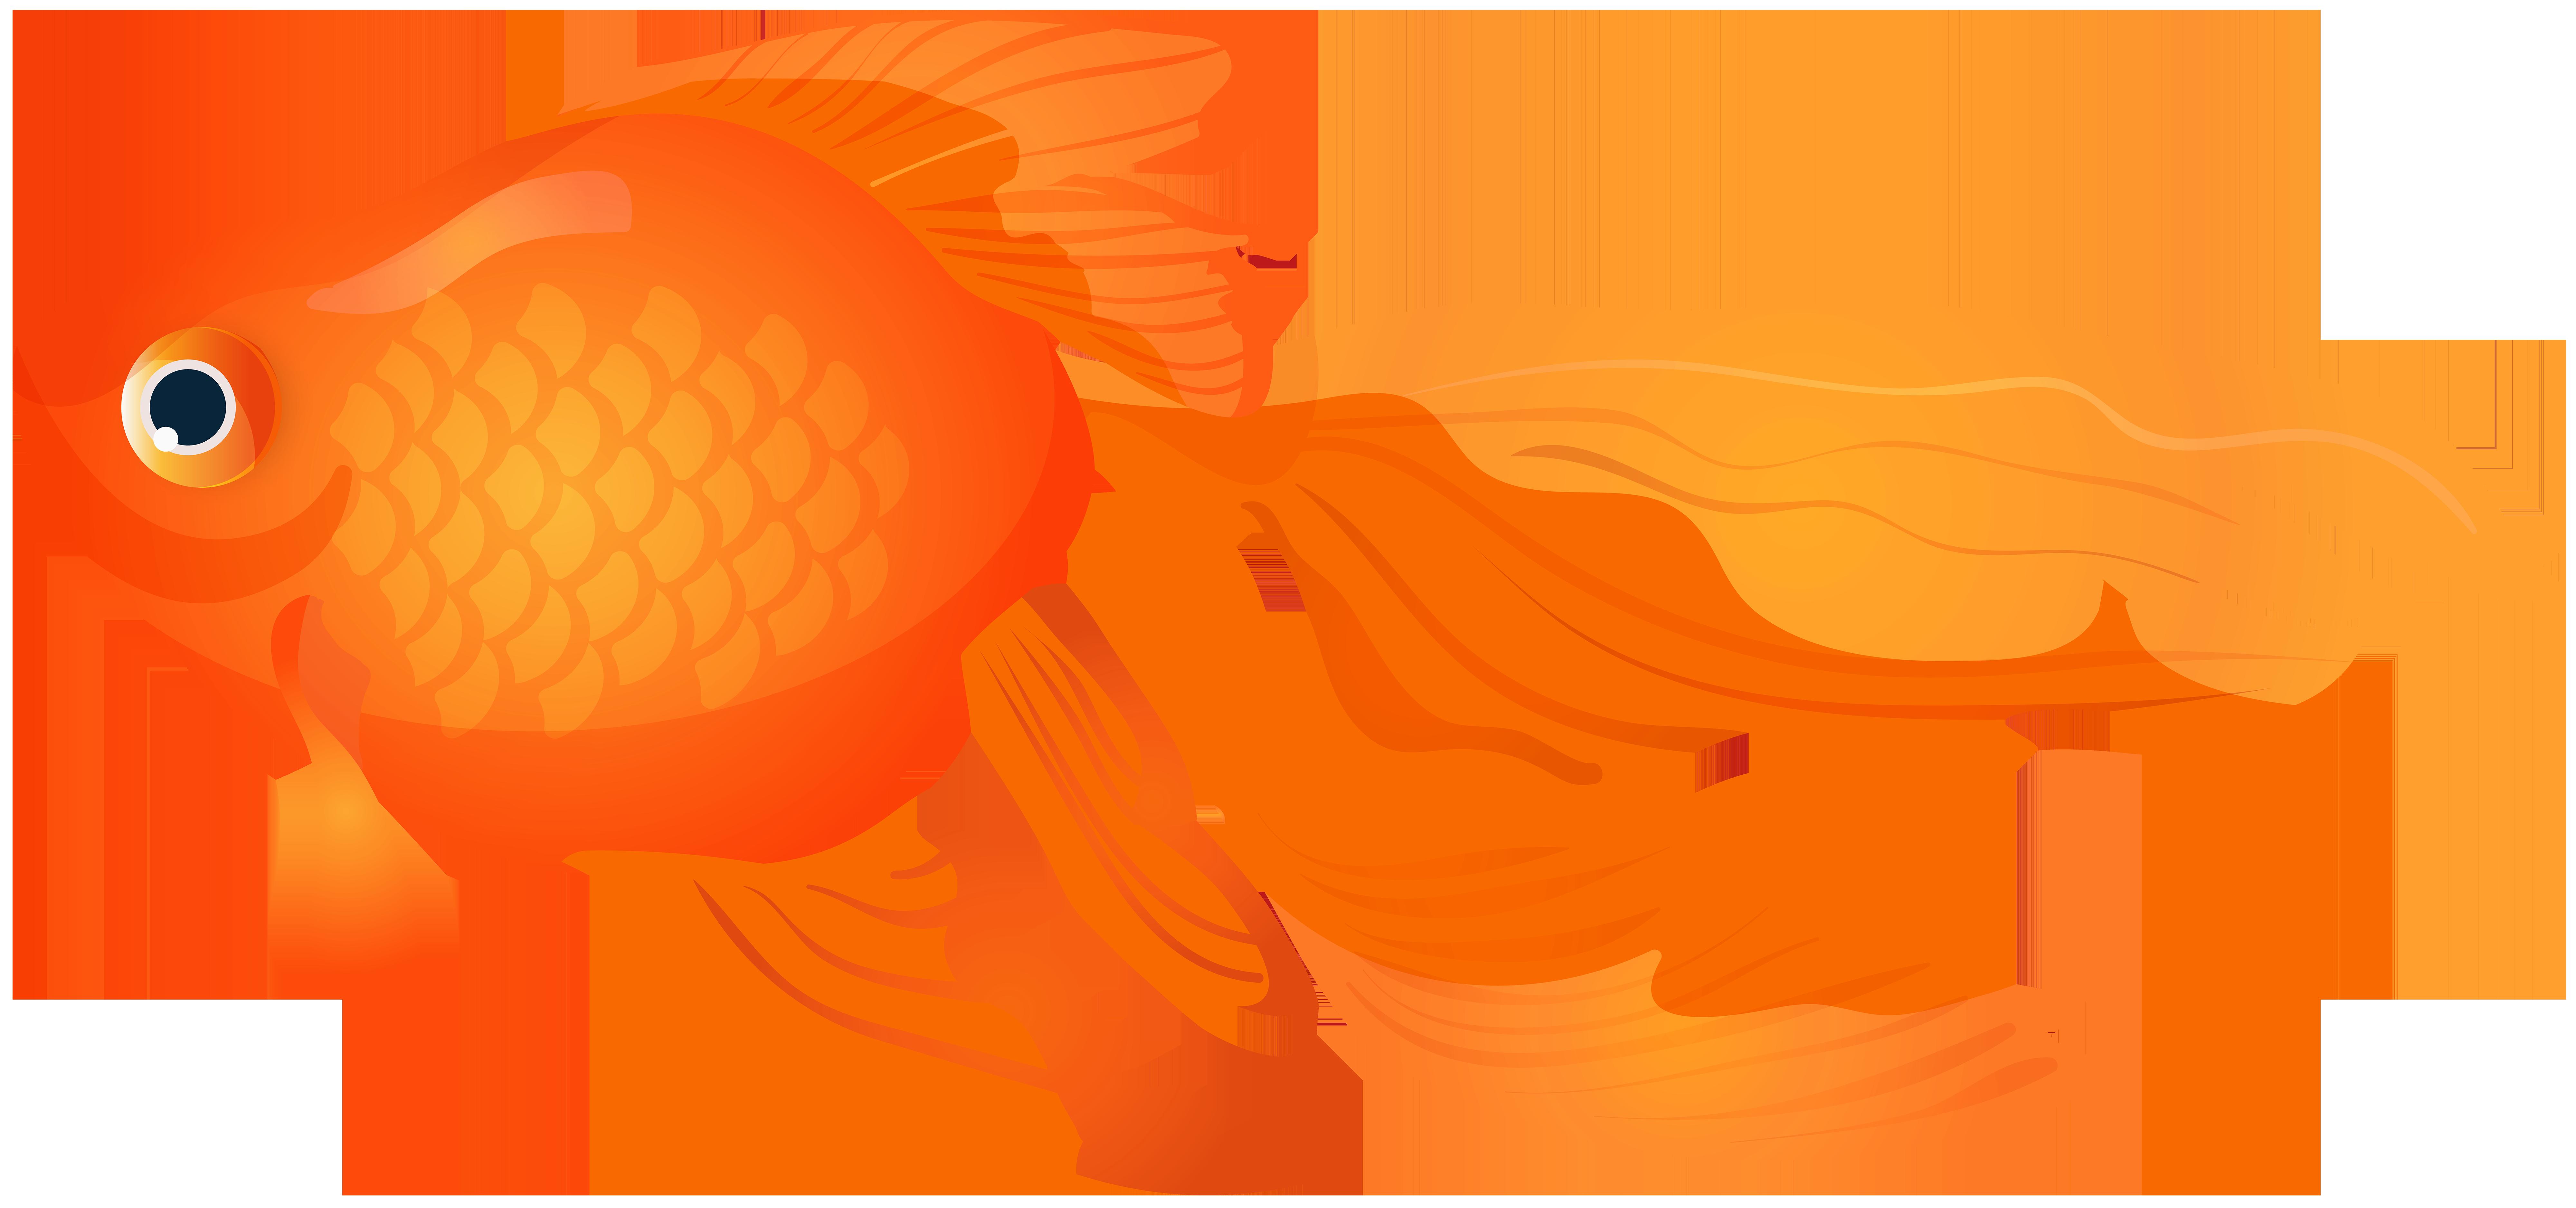 Goldfish clipart. Transparent png clip art